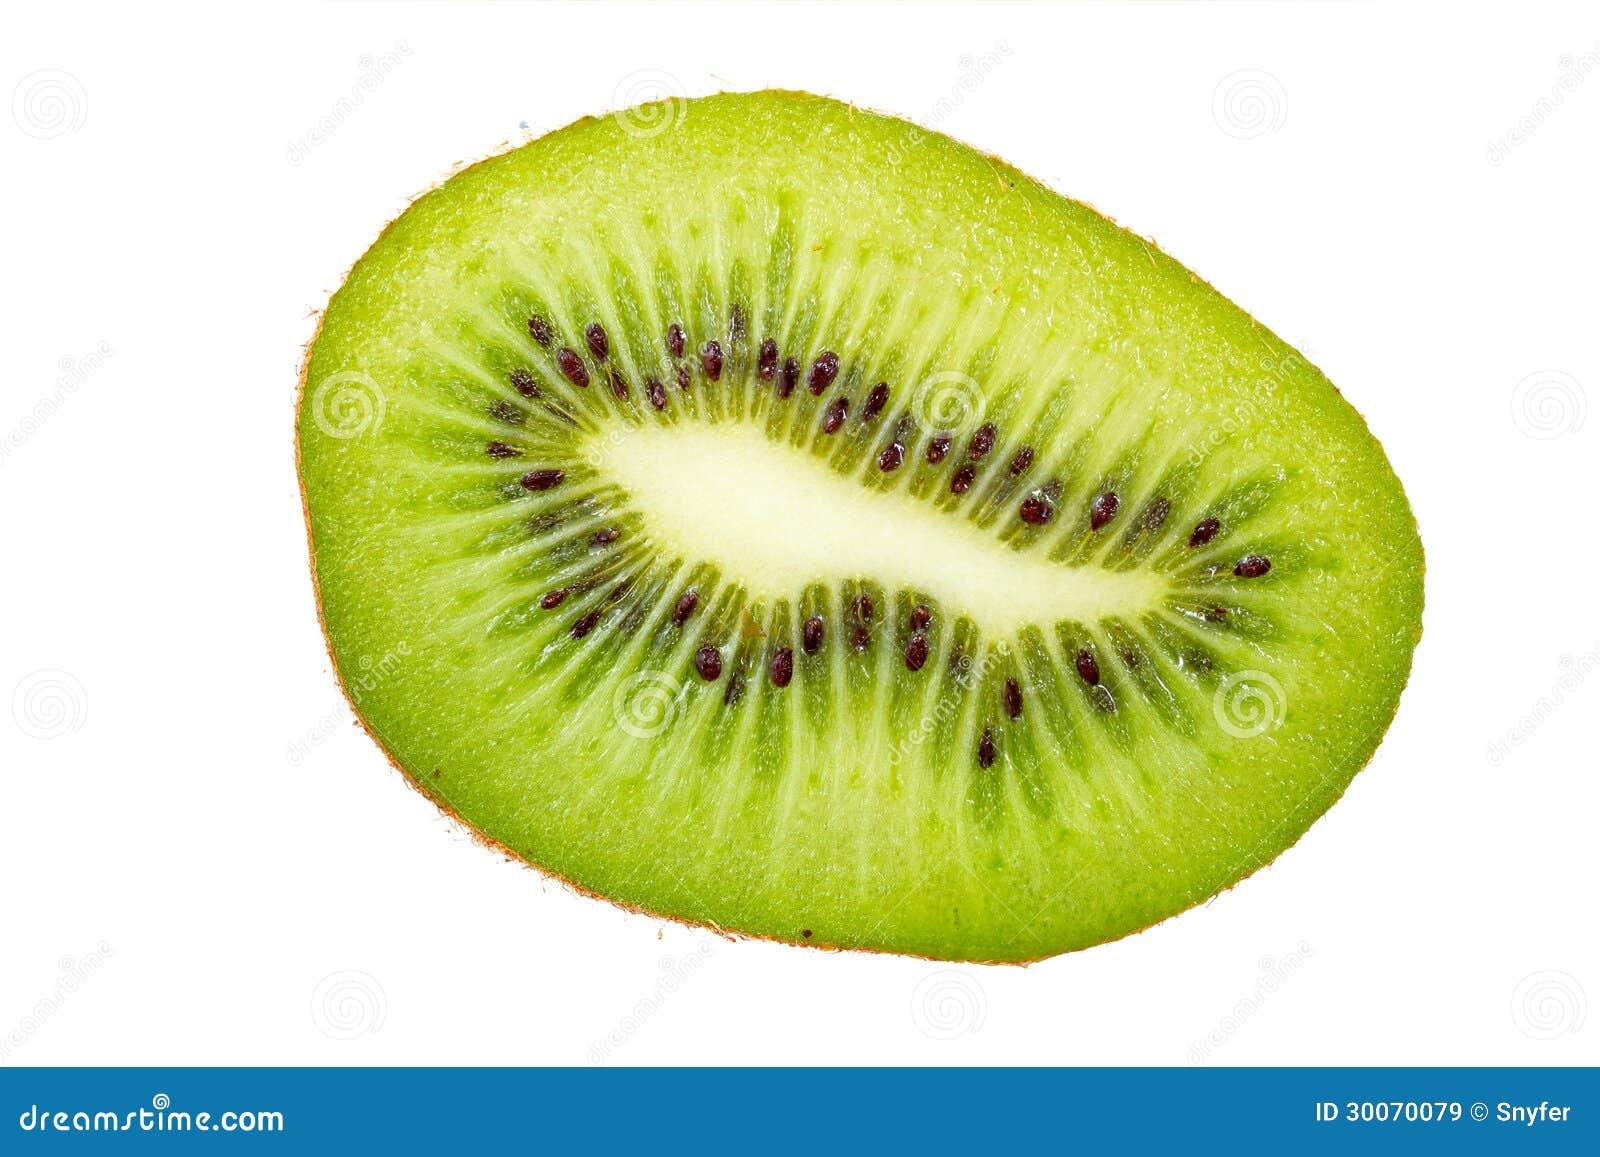 Kiwi fruit cut in half close up - Kiwi Fruit Cross Section Royalty Free Stock Images